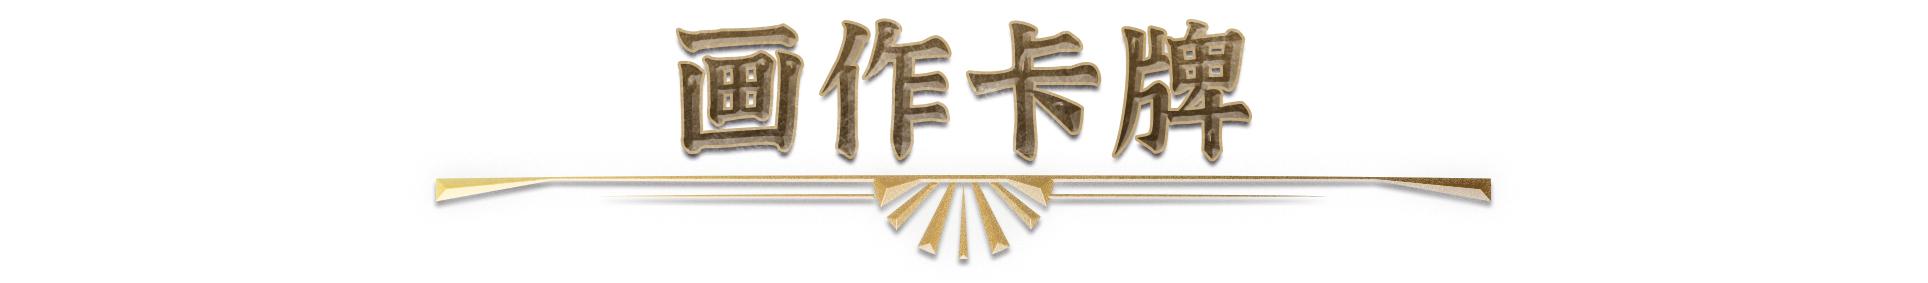 titre2-ks-画作卡牌.jpg